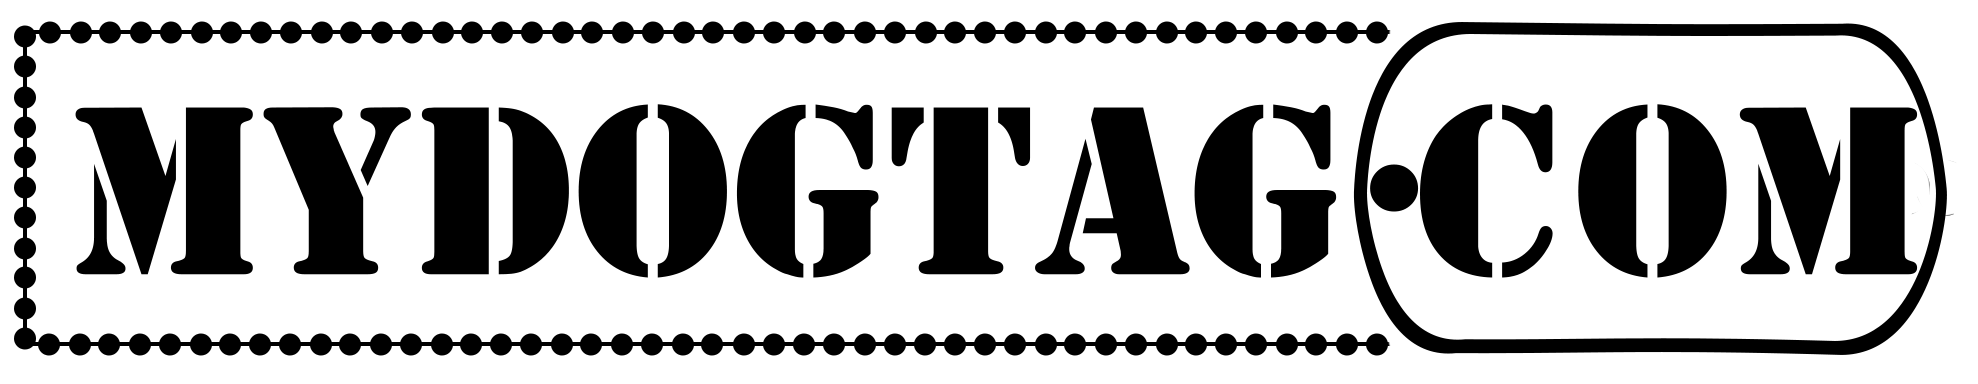 32832028 e61f 47fb a3e3 e060aa127575